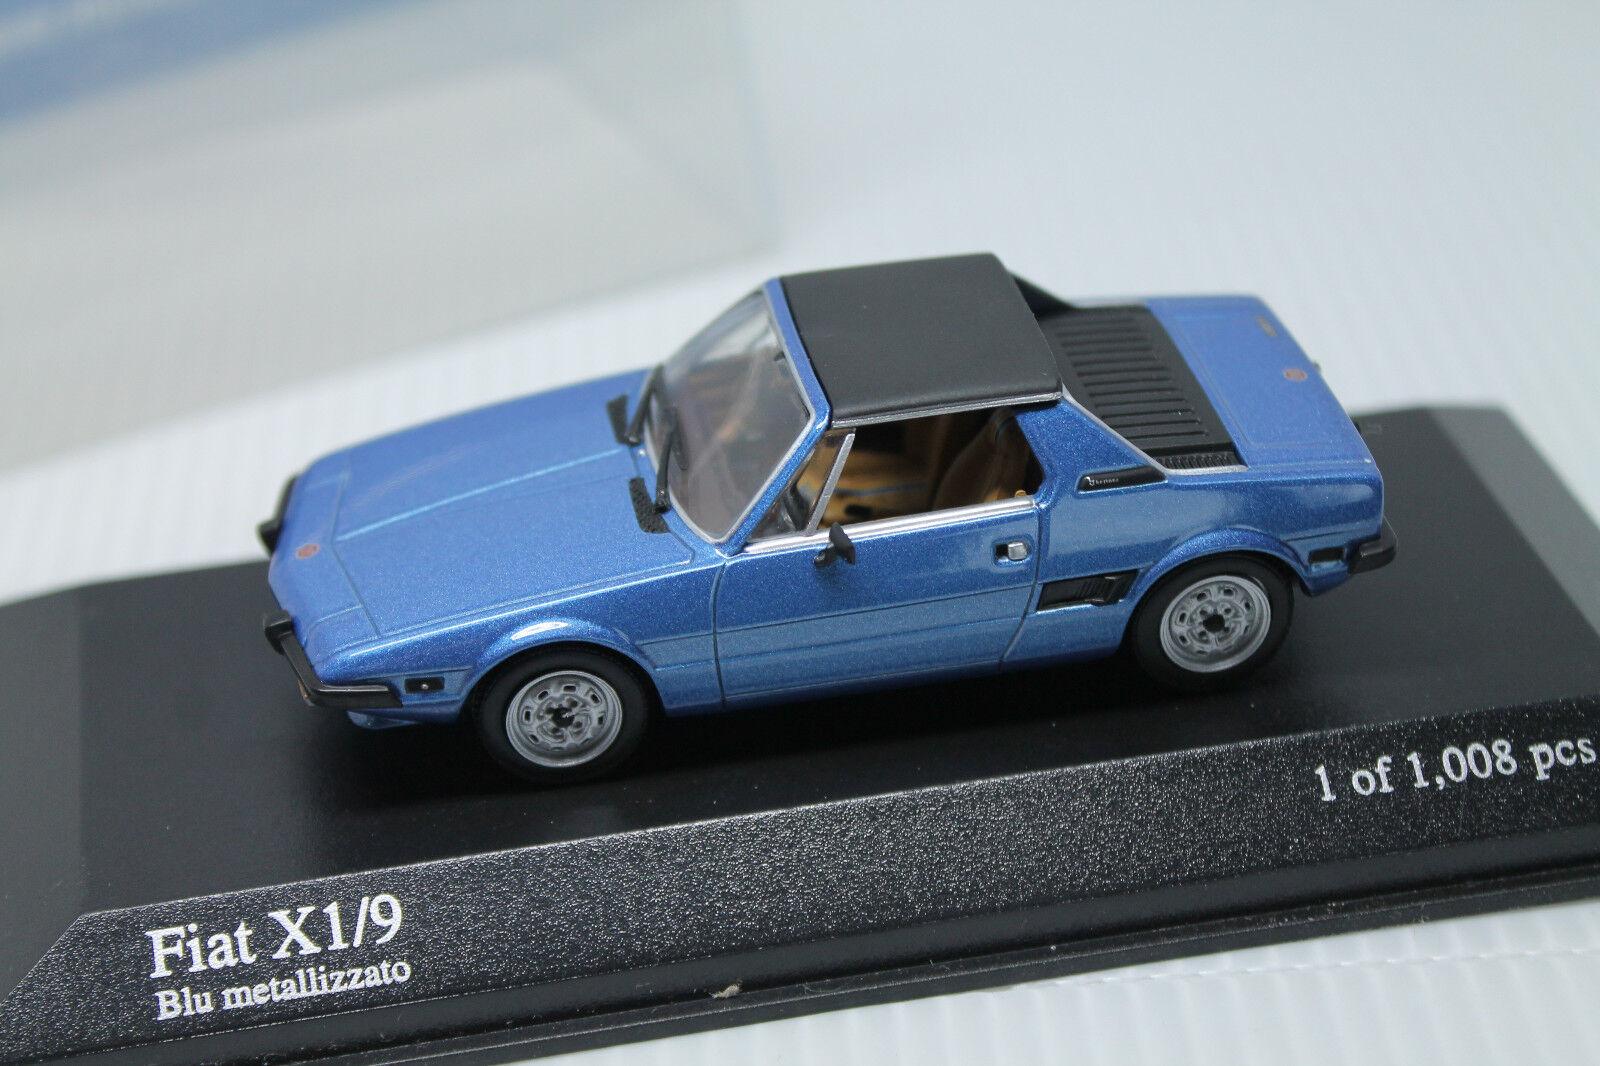 Minichamps  Fiat x1 9  1974  1 1 1 43  embalaje original  metalizado azul  limitado 1008 db29a1